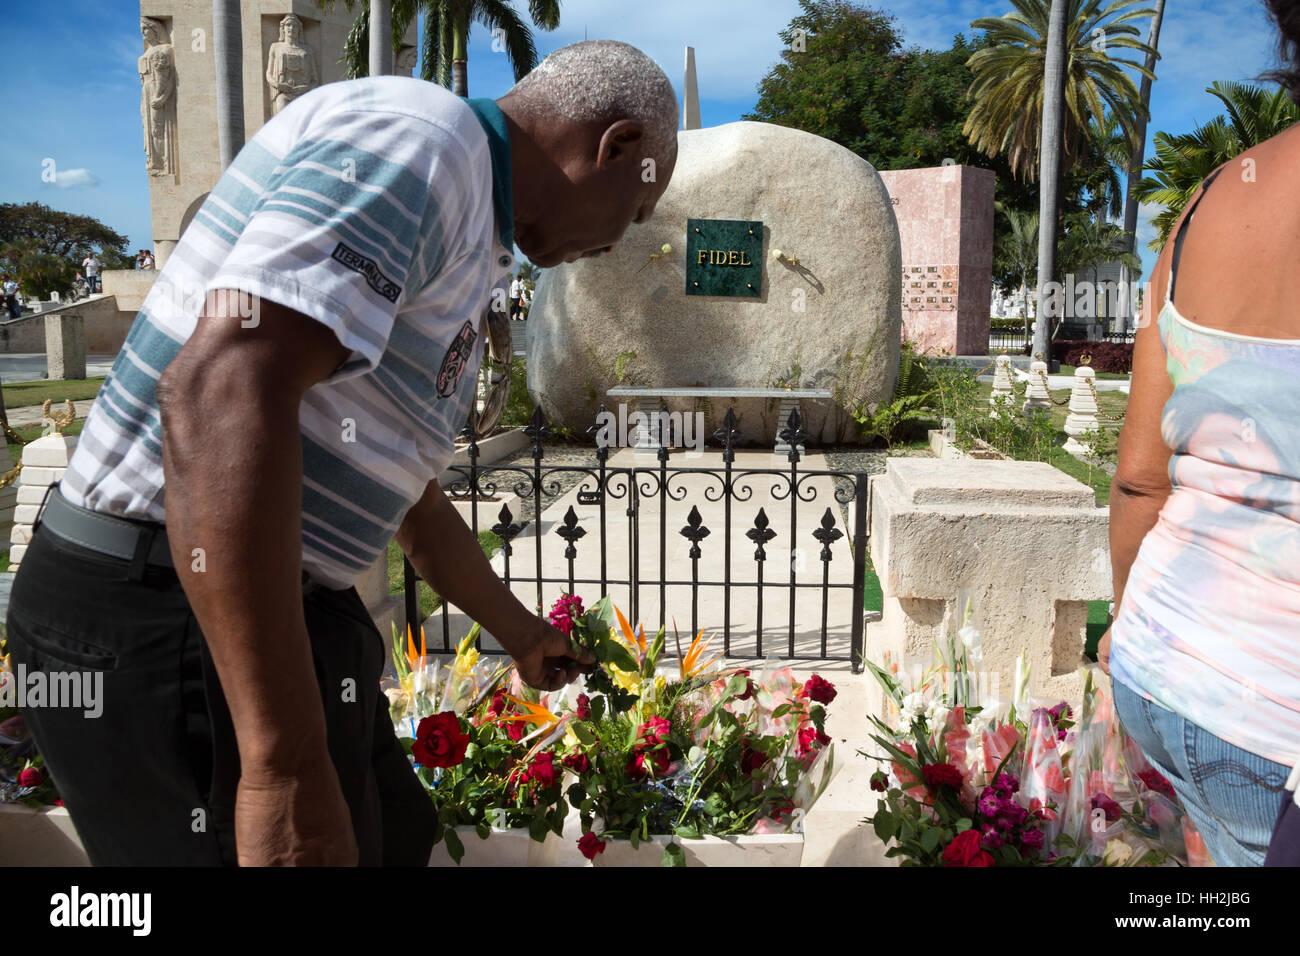 Fidel Castro' s Grab in Santa Ifigenia Friedhof, Santiago de Cuba Stockbild